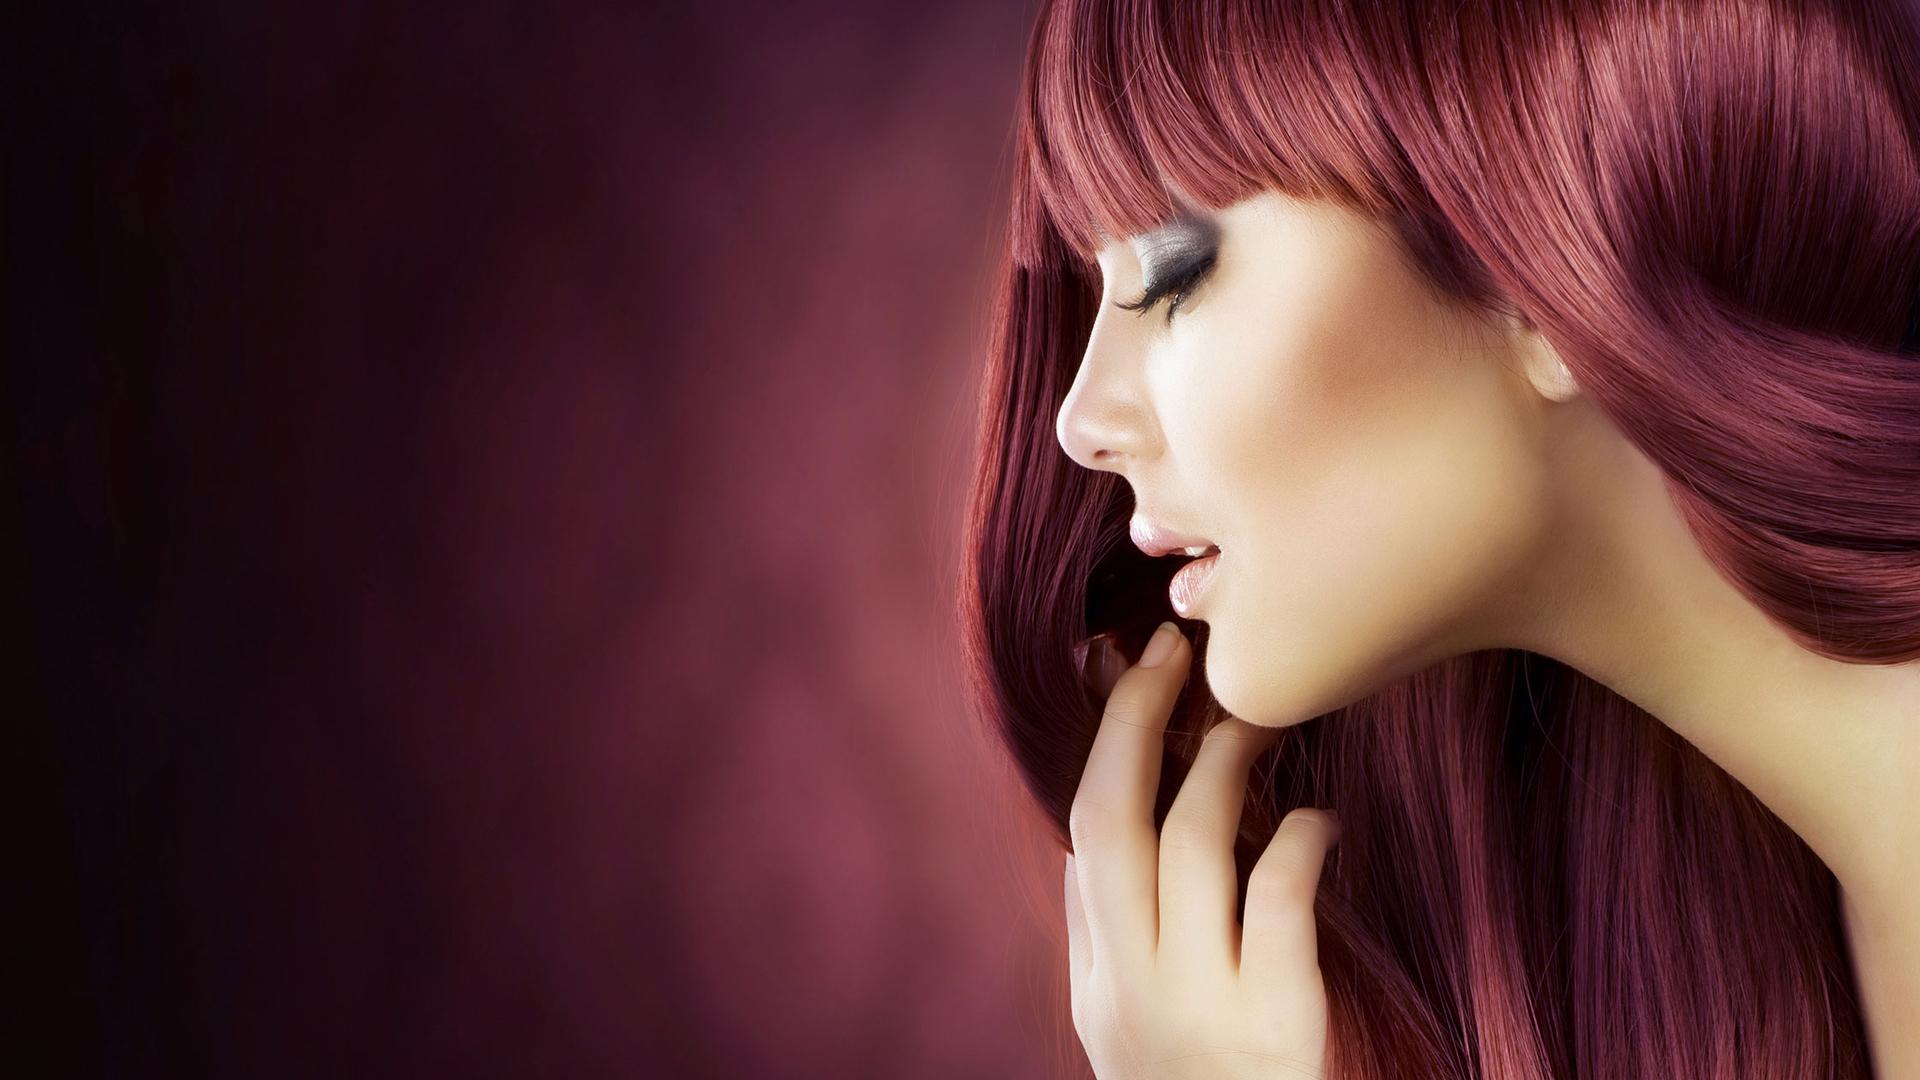 Closeup Beauty Studio Fashion Portrait Young Stock Foto